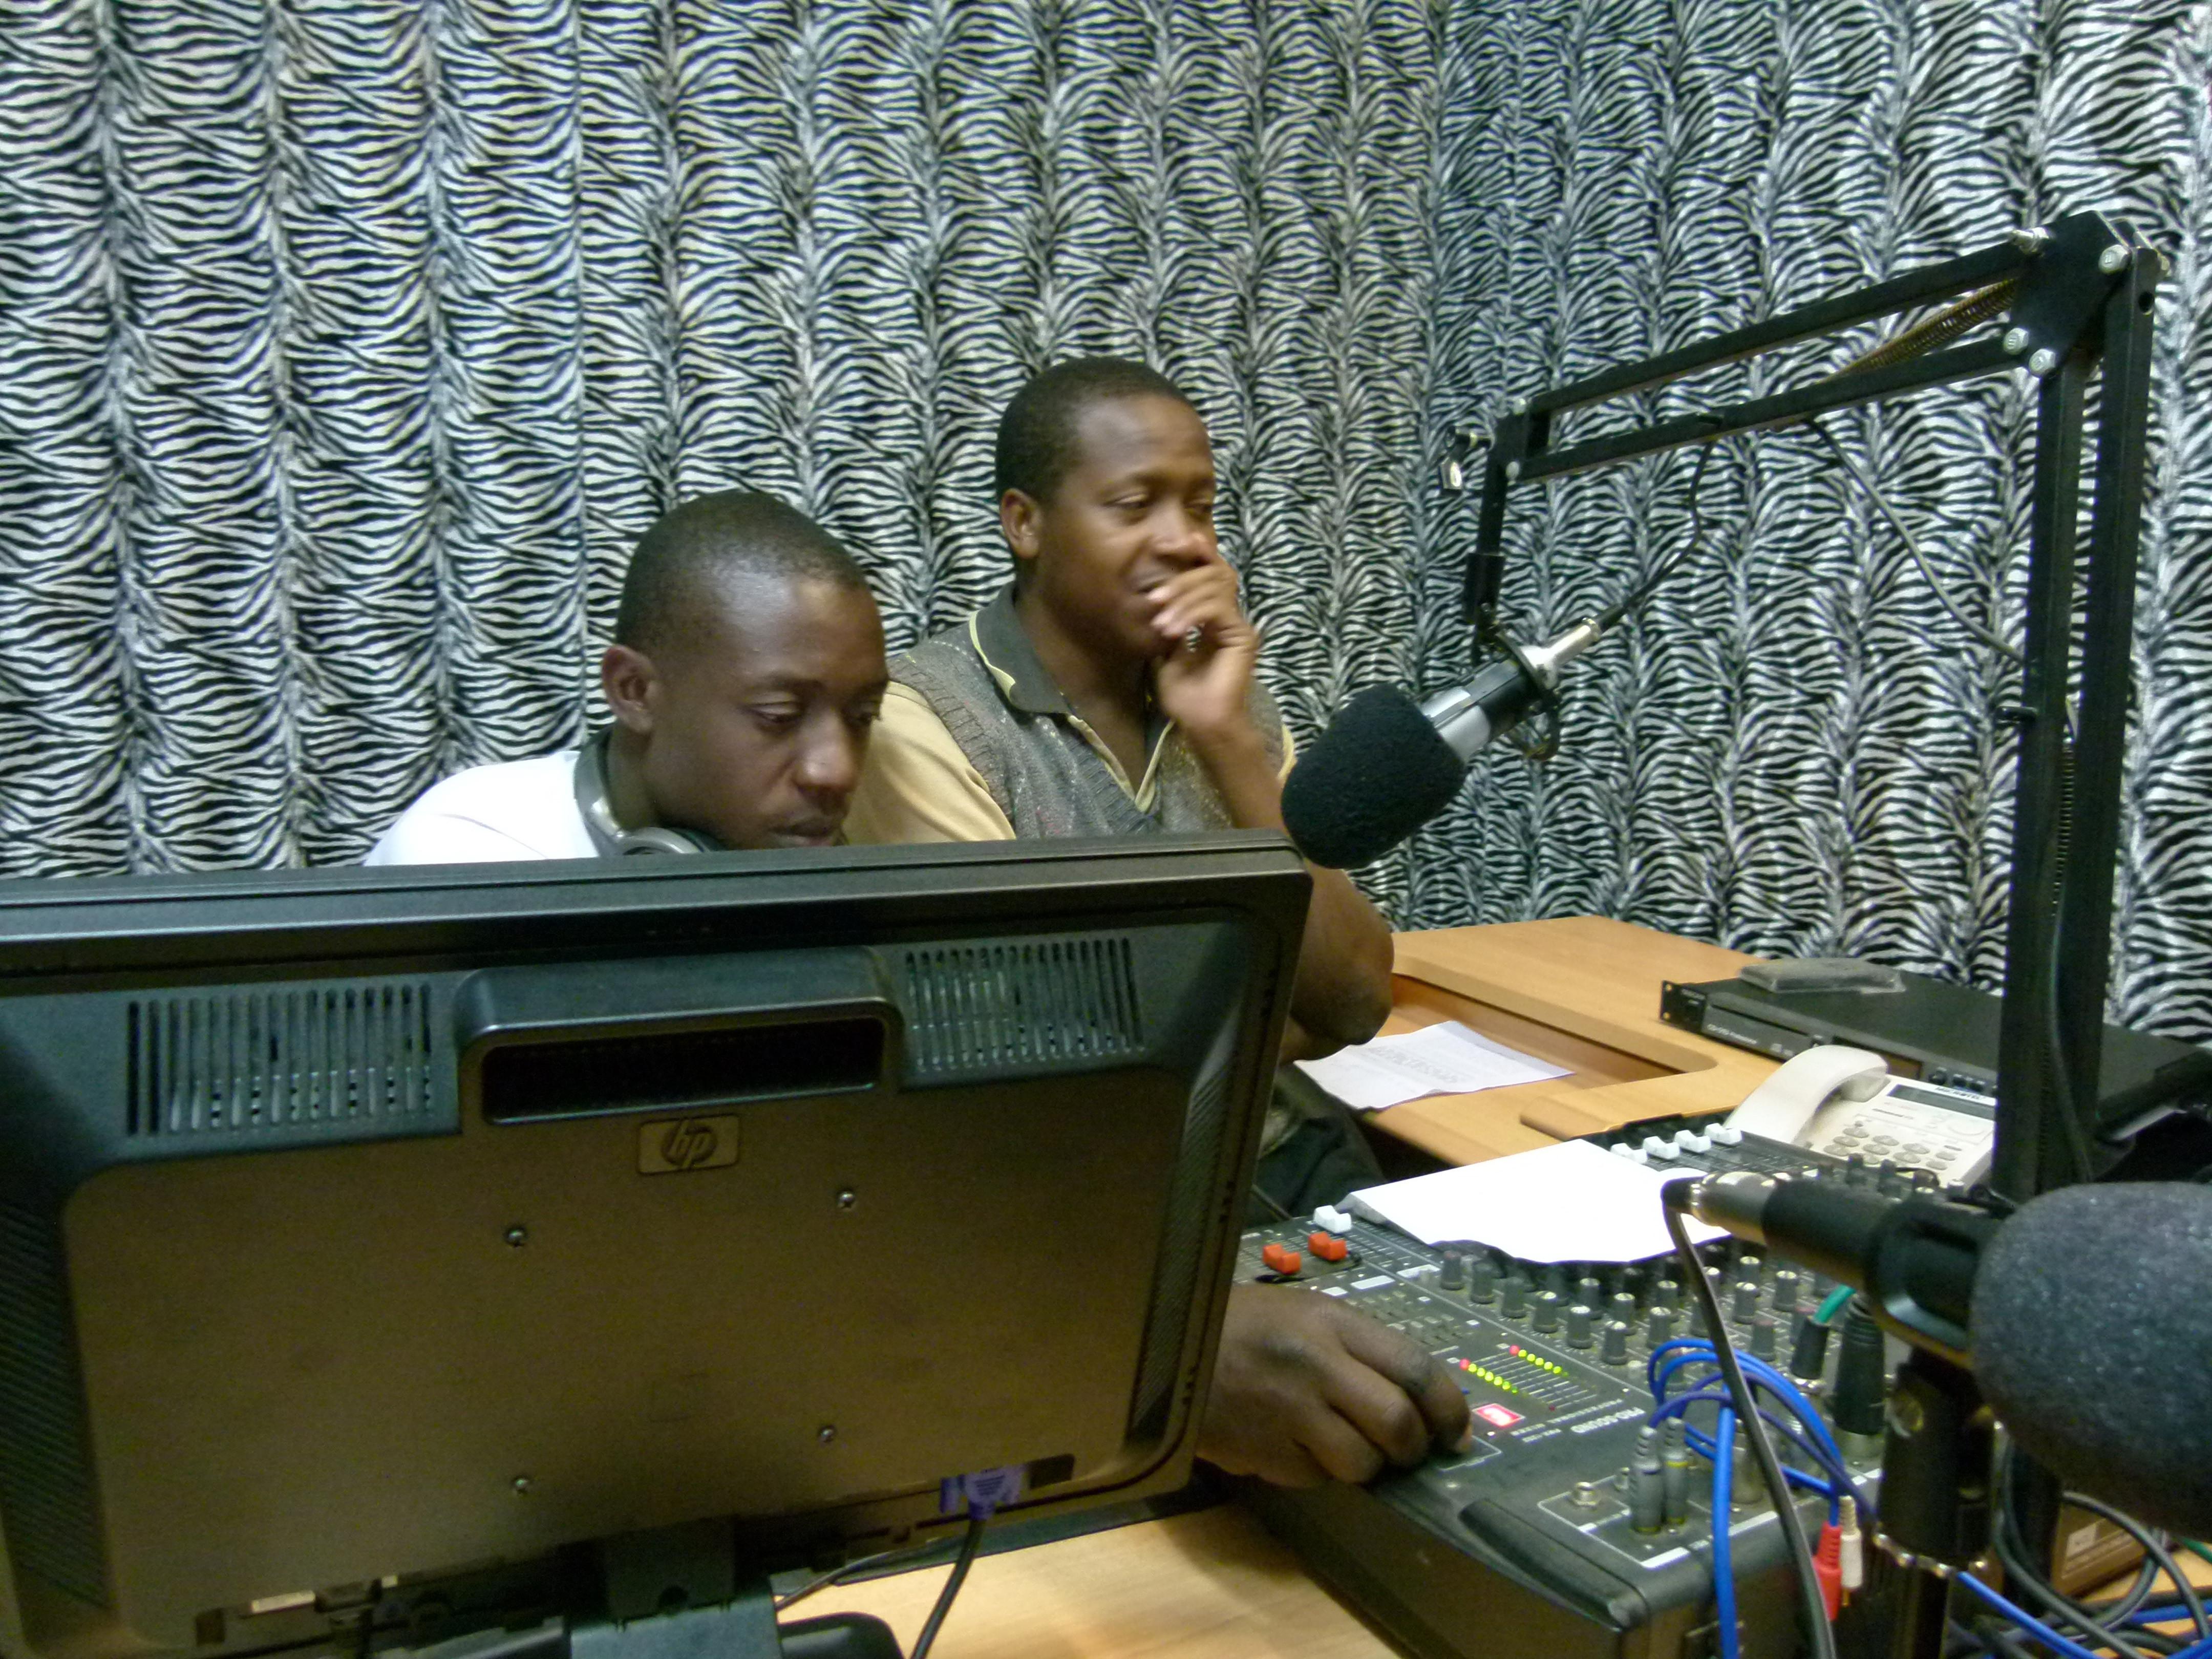 Zanger George da Soulchild links en de discjockey/interviewer Milli Jam rechts in de studio van Zambezi FM Radio